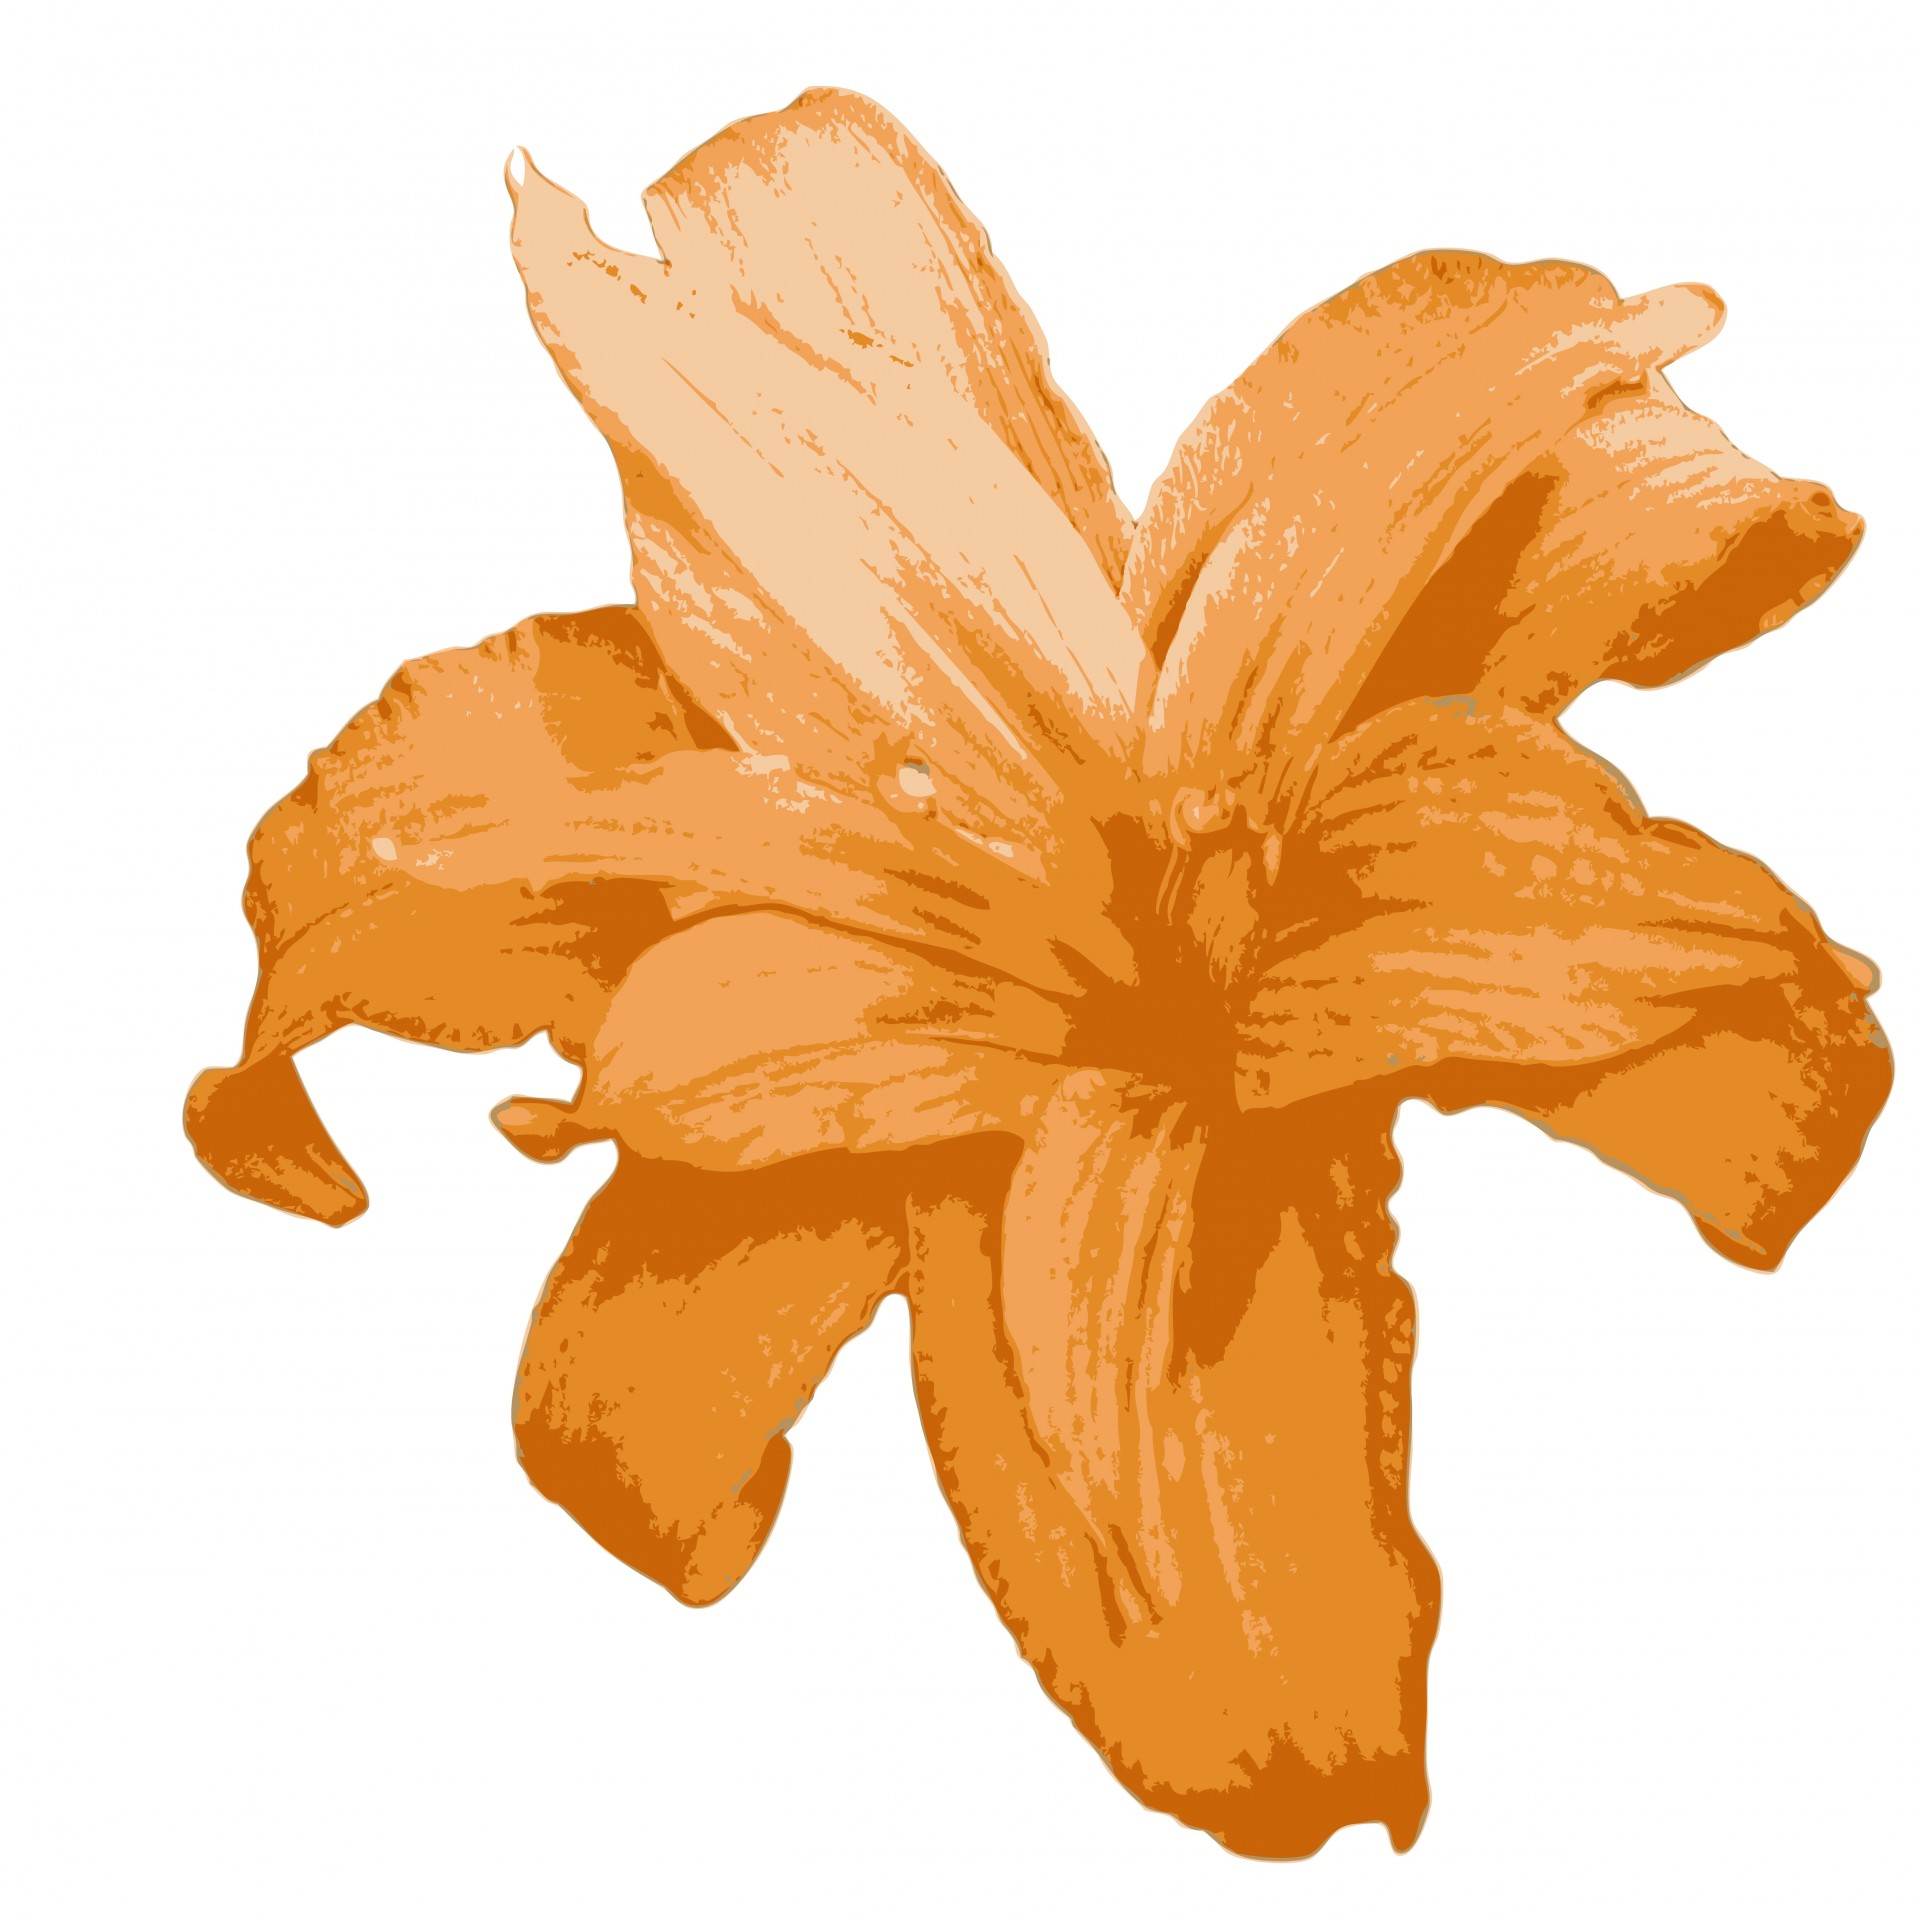 Orange Lily Flower Clipart Free Stock Photo.